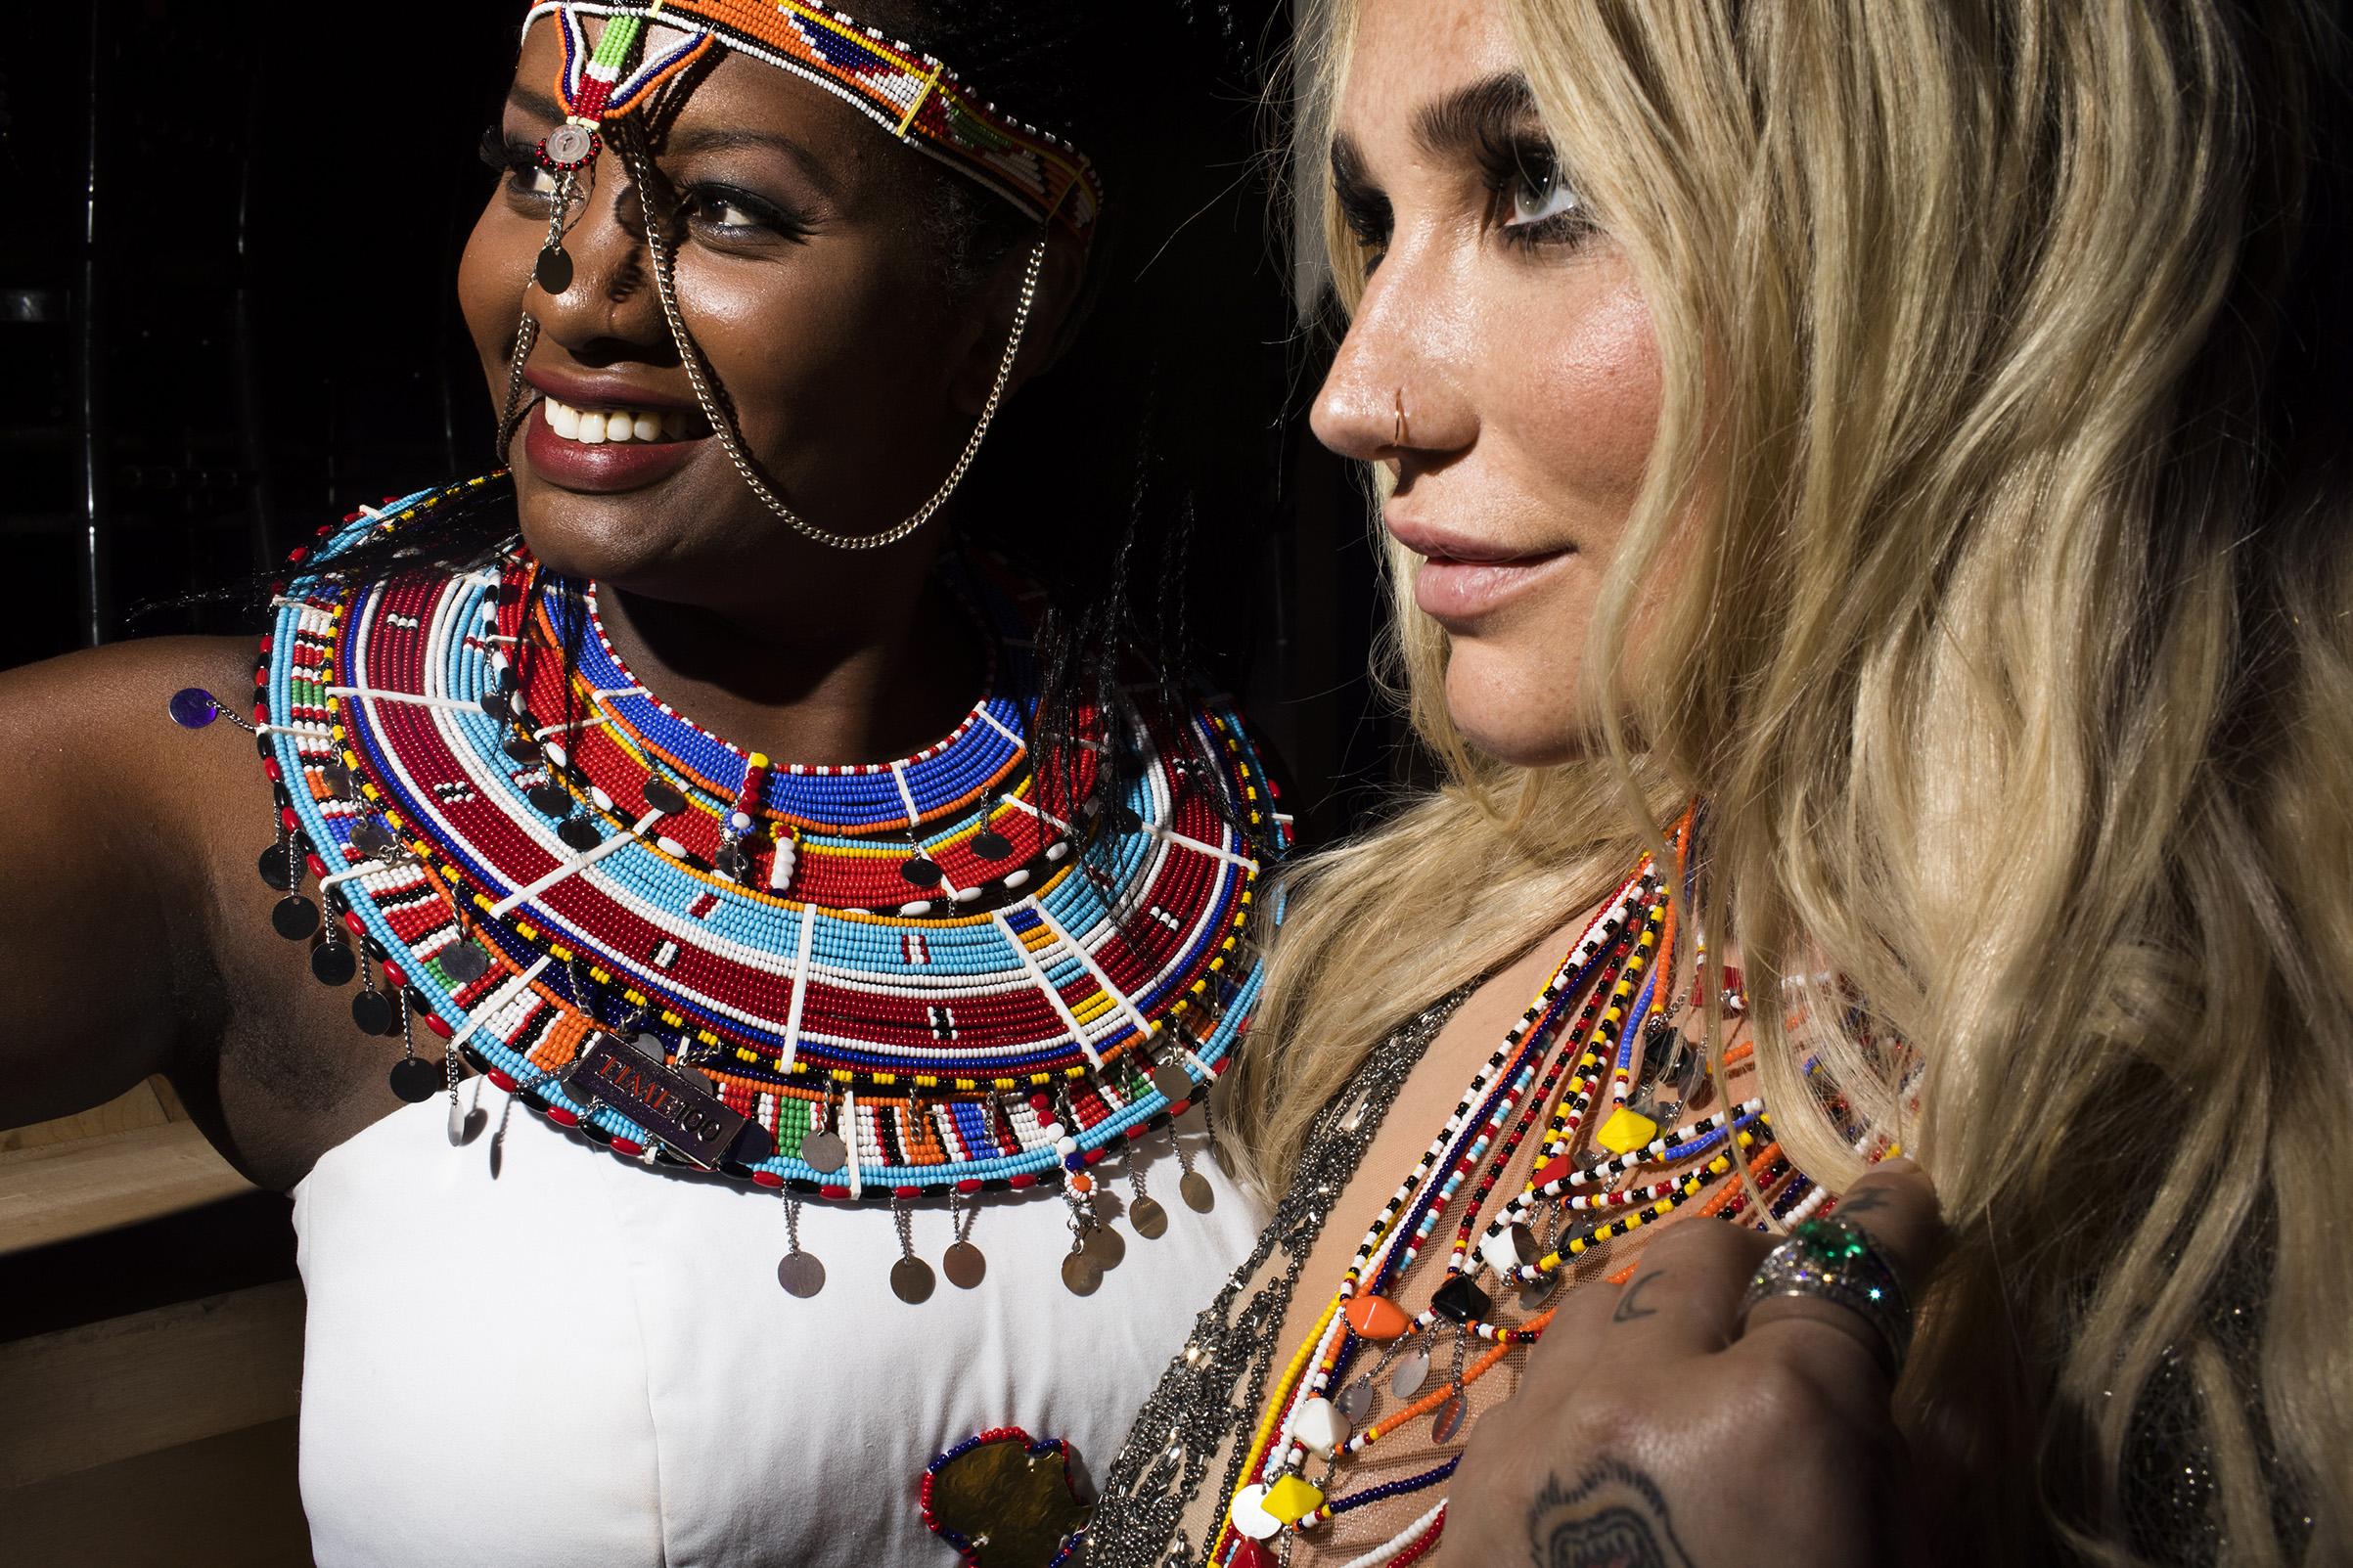 Human Rights Activist Nice Nailantei Leng'ete and Kesha at the Time 100 Gala at Jazz at Lincoln Center on April 24, 2018 in New York City.